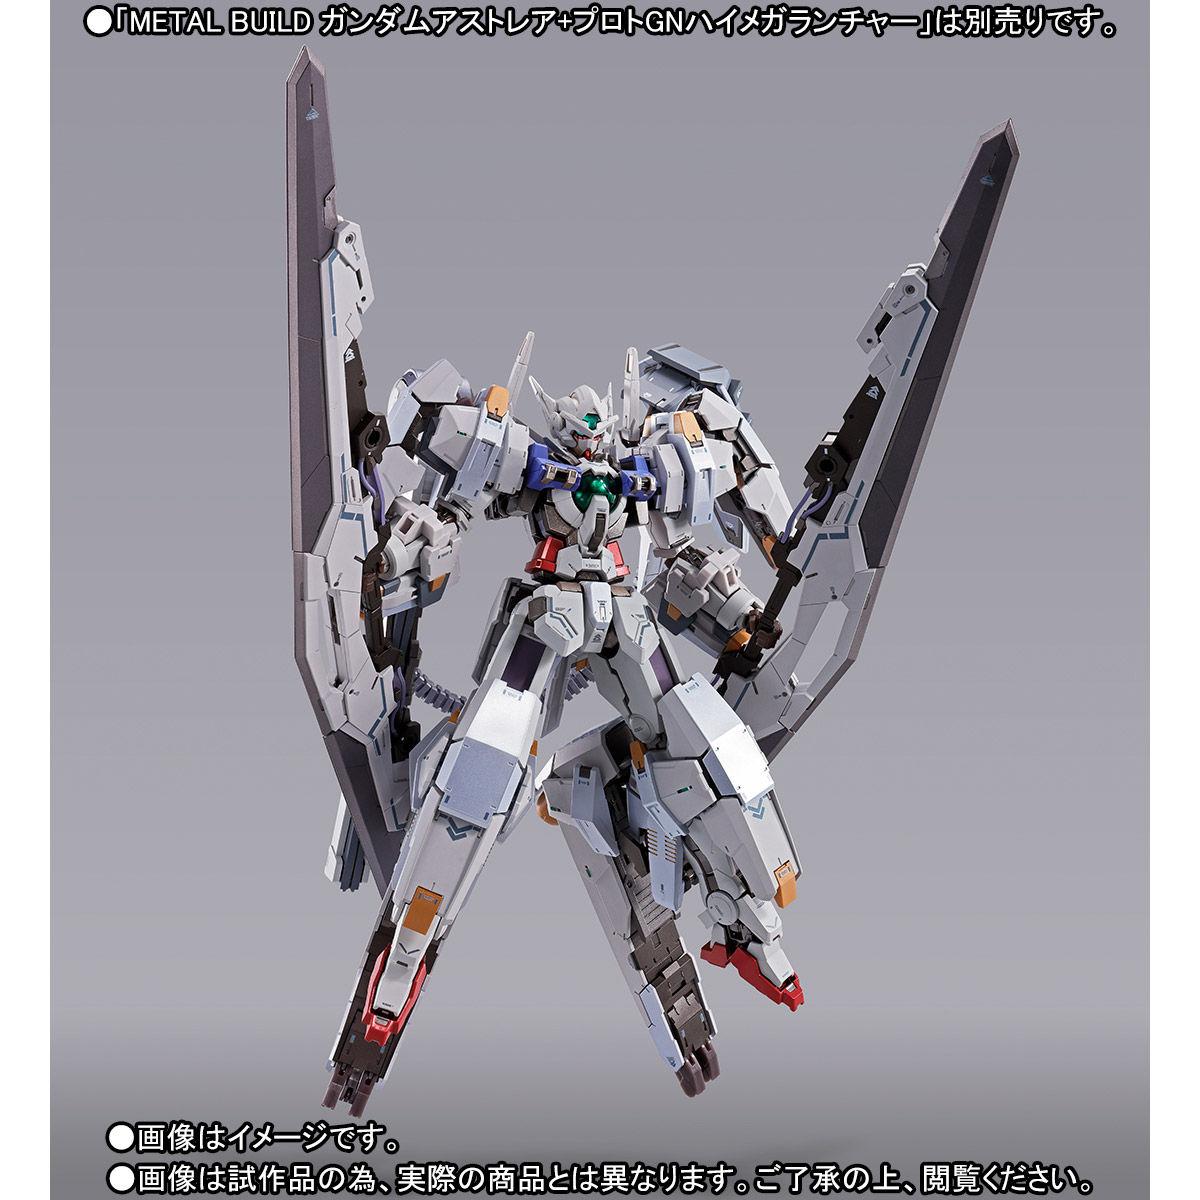 METAL BUILD『ガンダムアストレア用高機動試験装備』機動戦士ガンダム00P 可動フィギュア-002